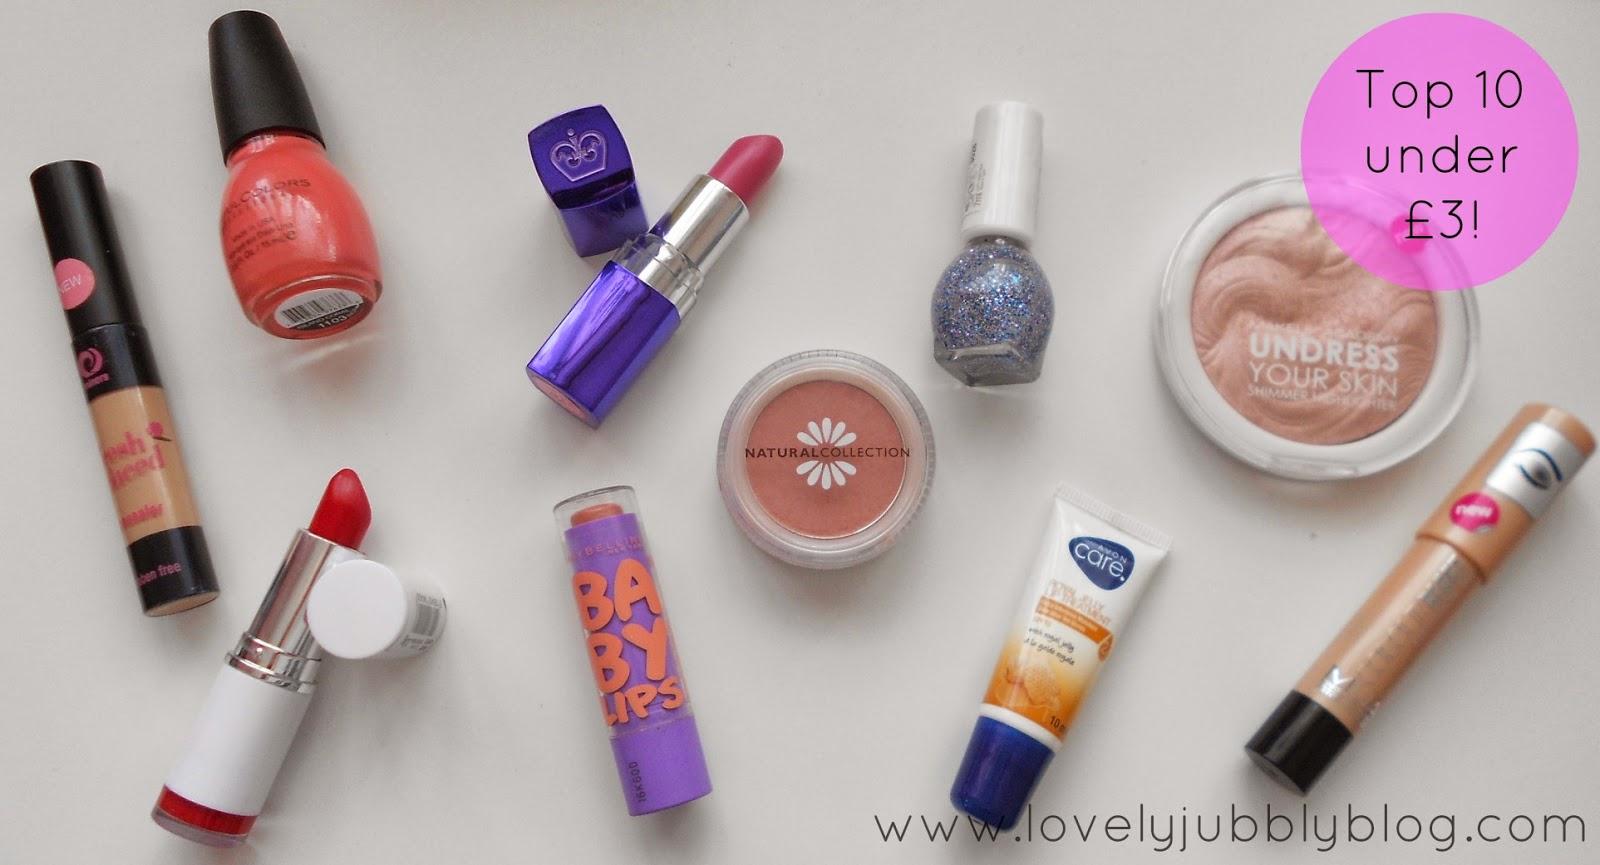 cheap beauty budget buys bargain under £3 £5 £10 pound shop ebay